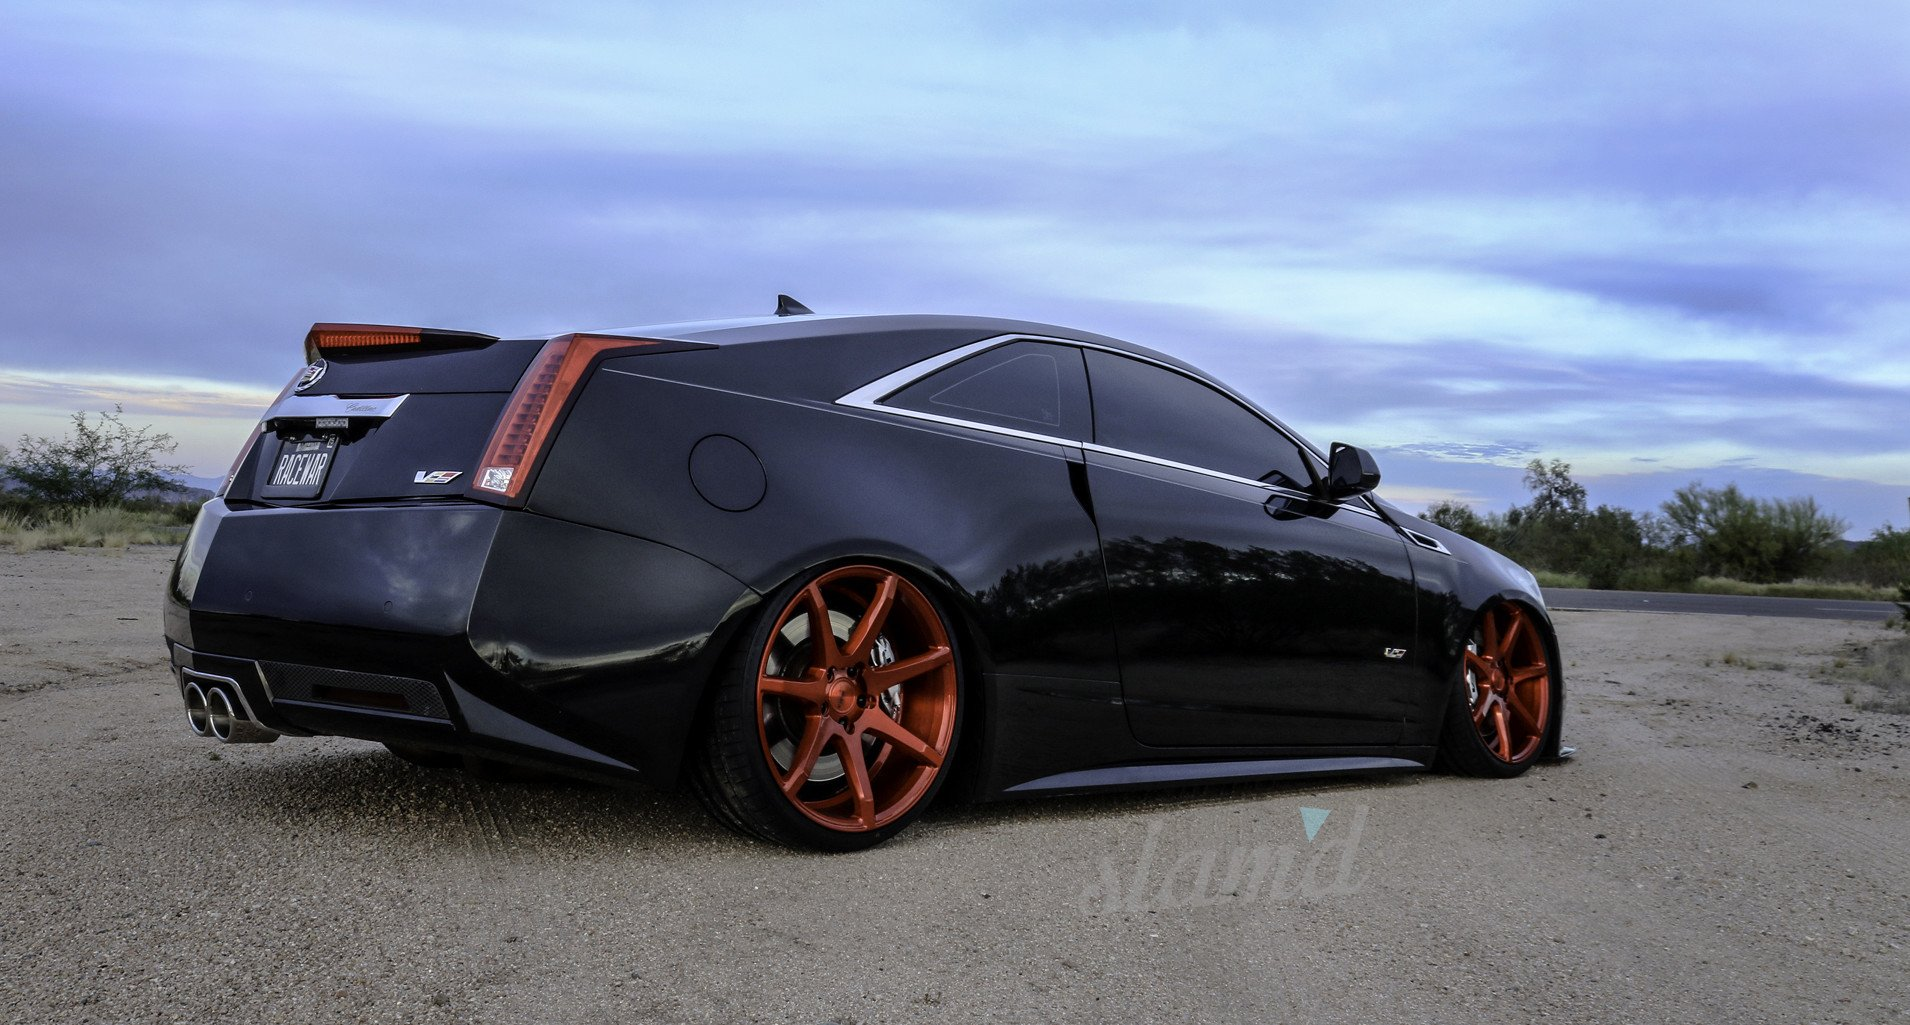 2012 Cadillac Ctsv Coupe Tuning Custom Lowrider Wallpaper